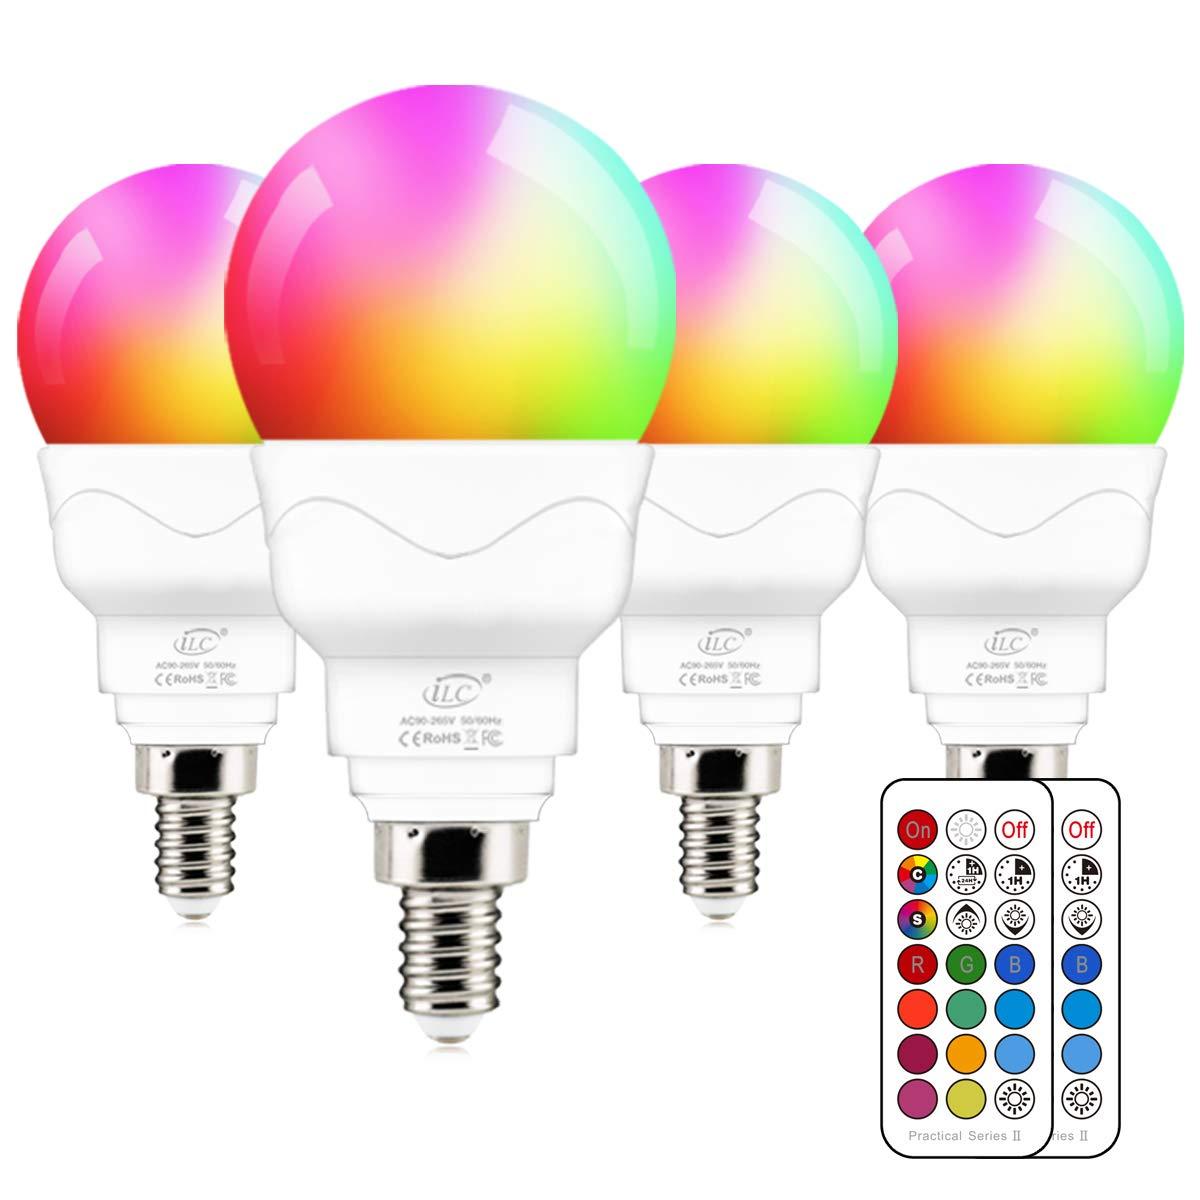 iLC E14 LED Light Bulb, 40W Equivalent, RGB Colour Changing, 5W 5700K Cool White  (4 Packs)